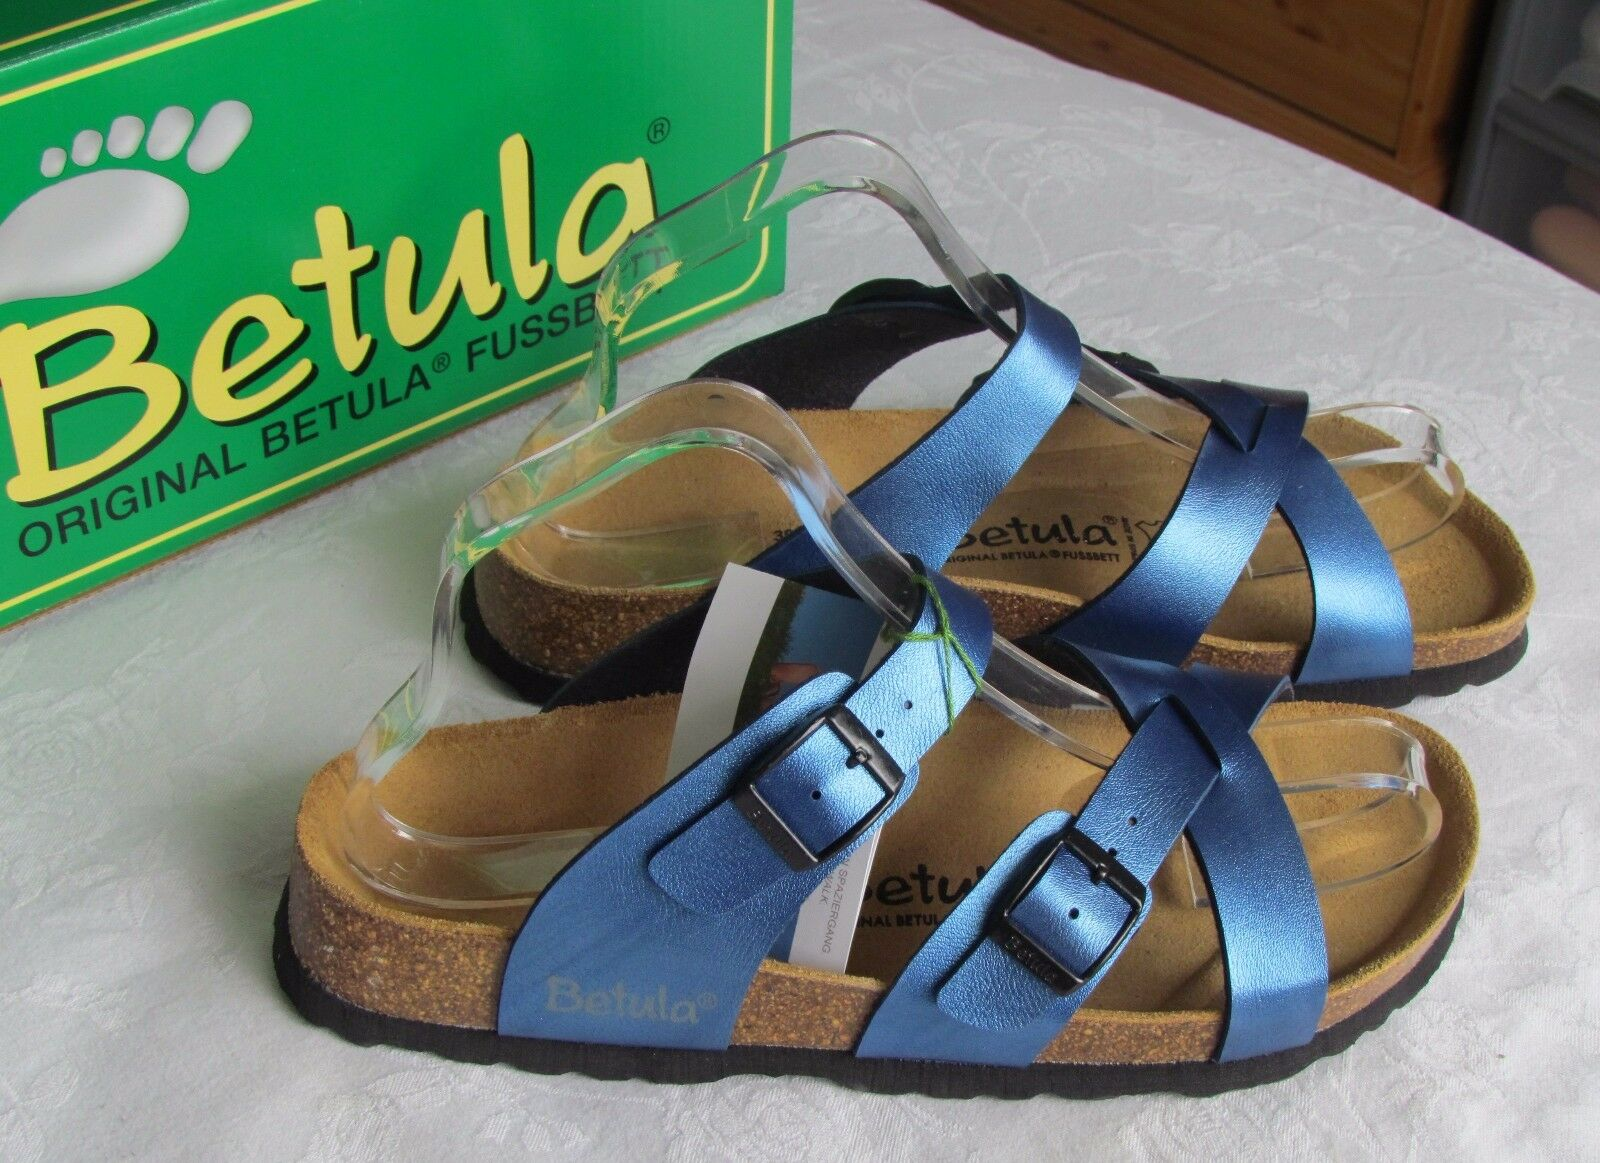 Nuevo Betula By Birkenstock Ladies Metálico Azul Mulas Sandalias UK Size 5.5